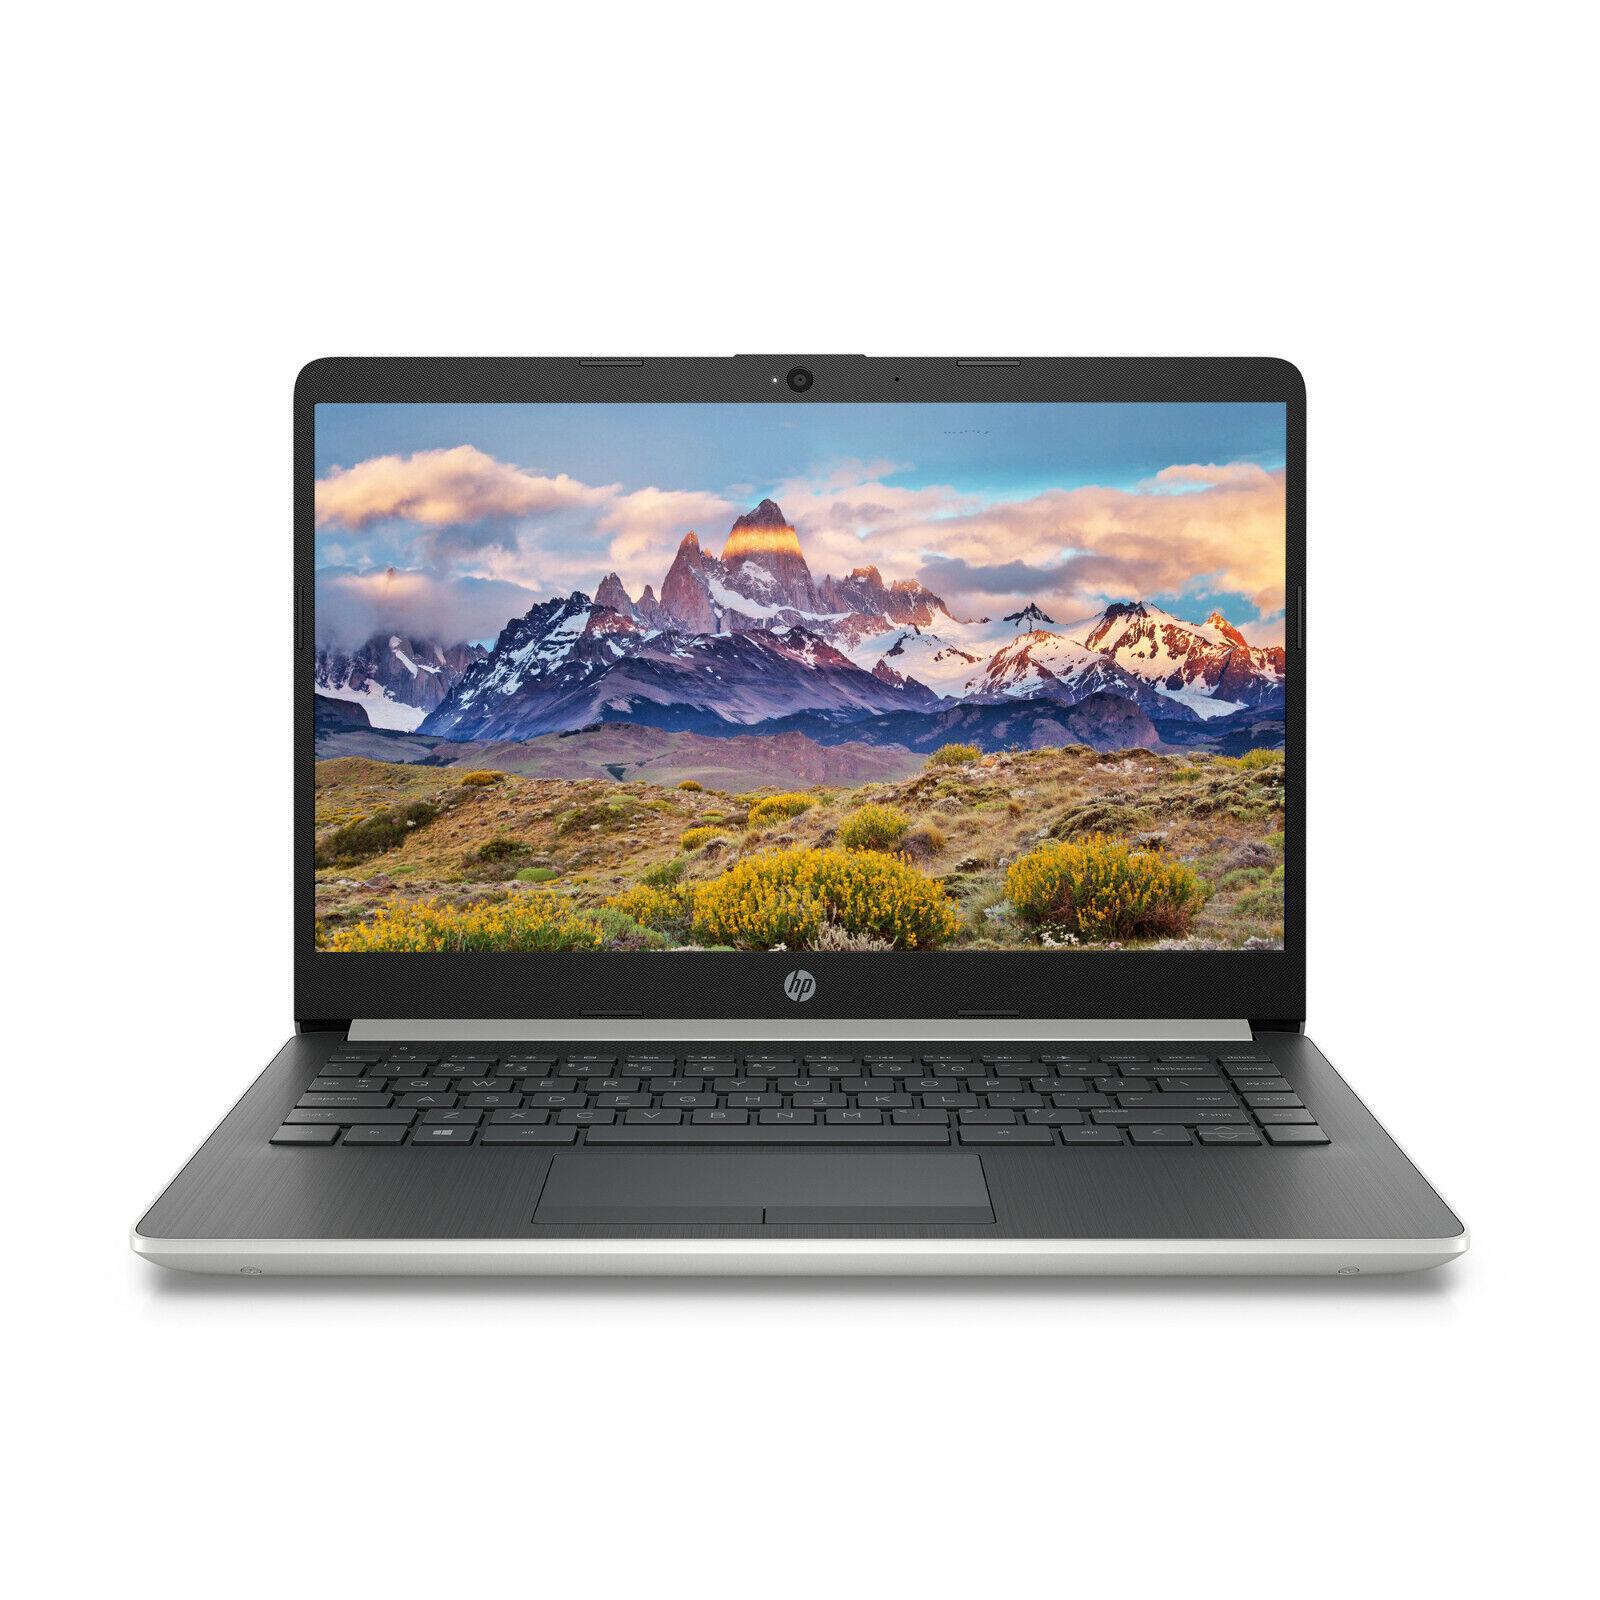 "Laptop Windows - NEW HP 14"" HD Intel 2.6GHz 4GB 64GB eMMC Windows 10 + 1Yr Microsoft Office"